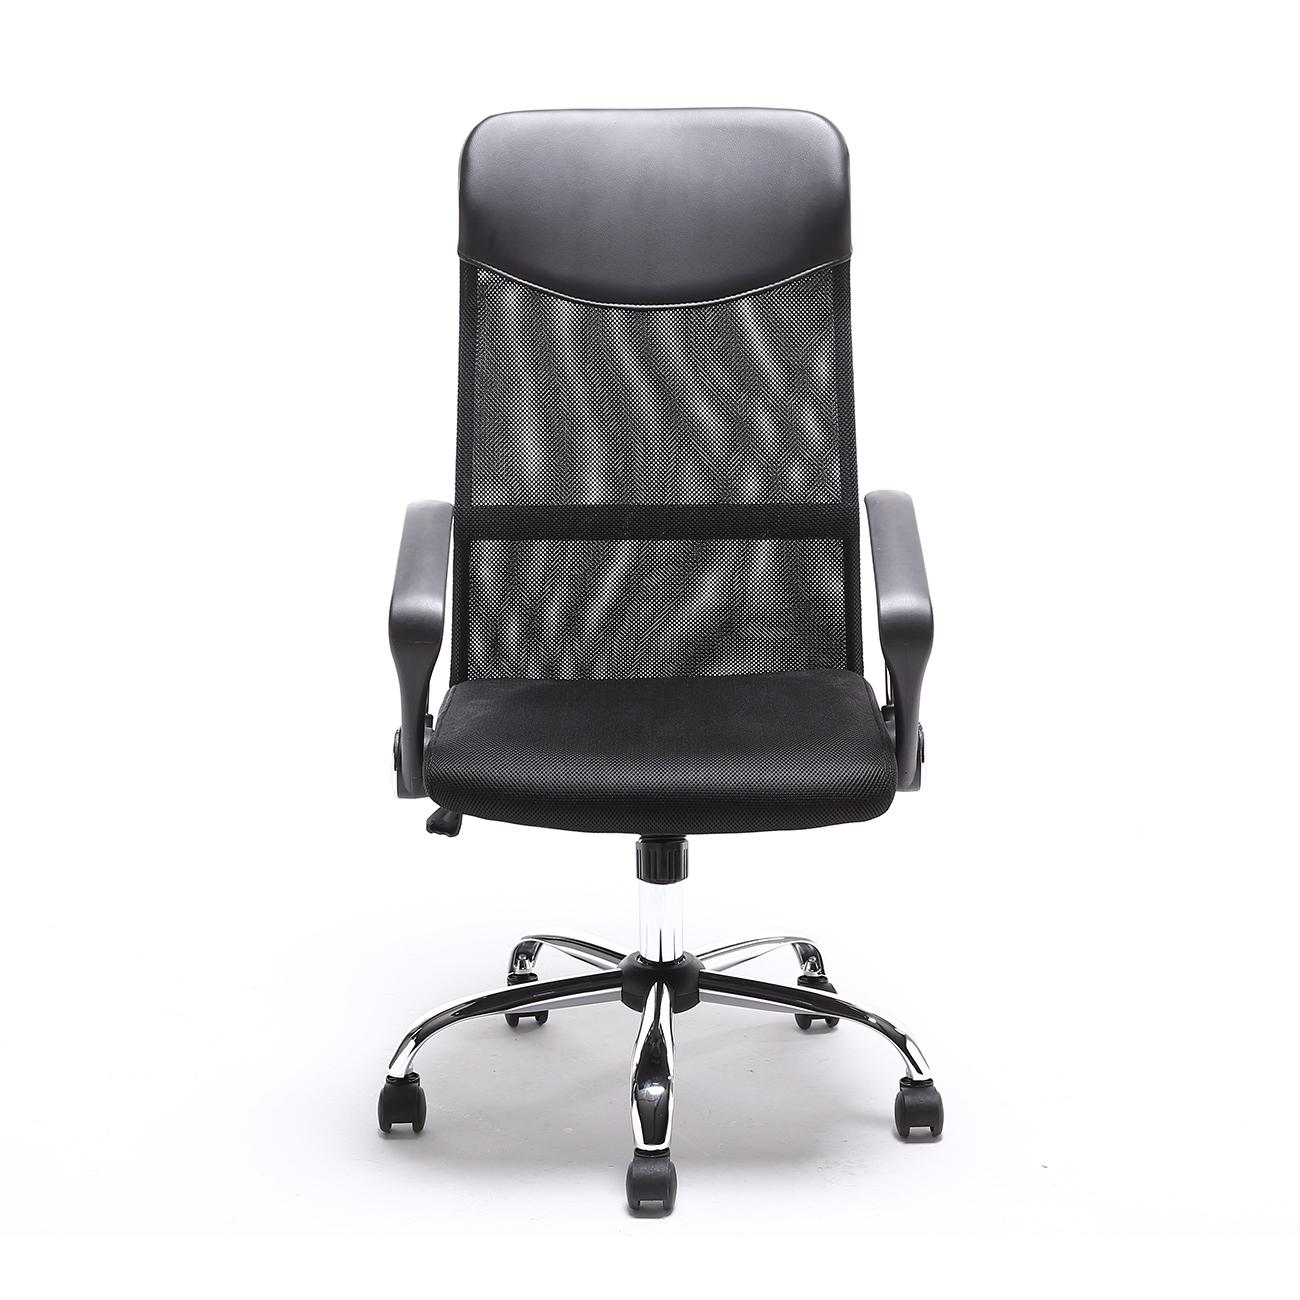 Executive ergonomic conference computer desk office task chair ebay - Black Modern Executive Ergonomic Mesh High Back Computer